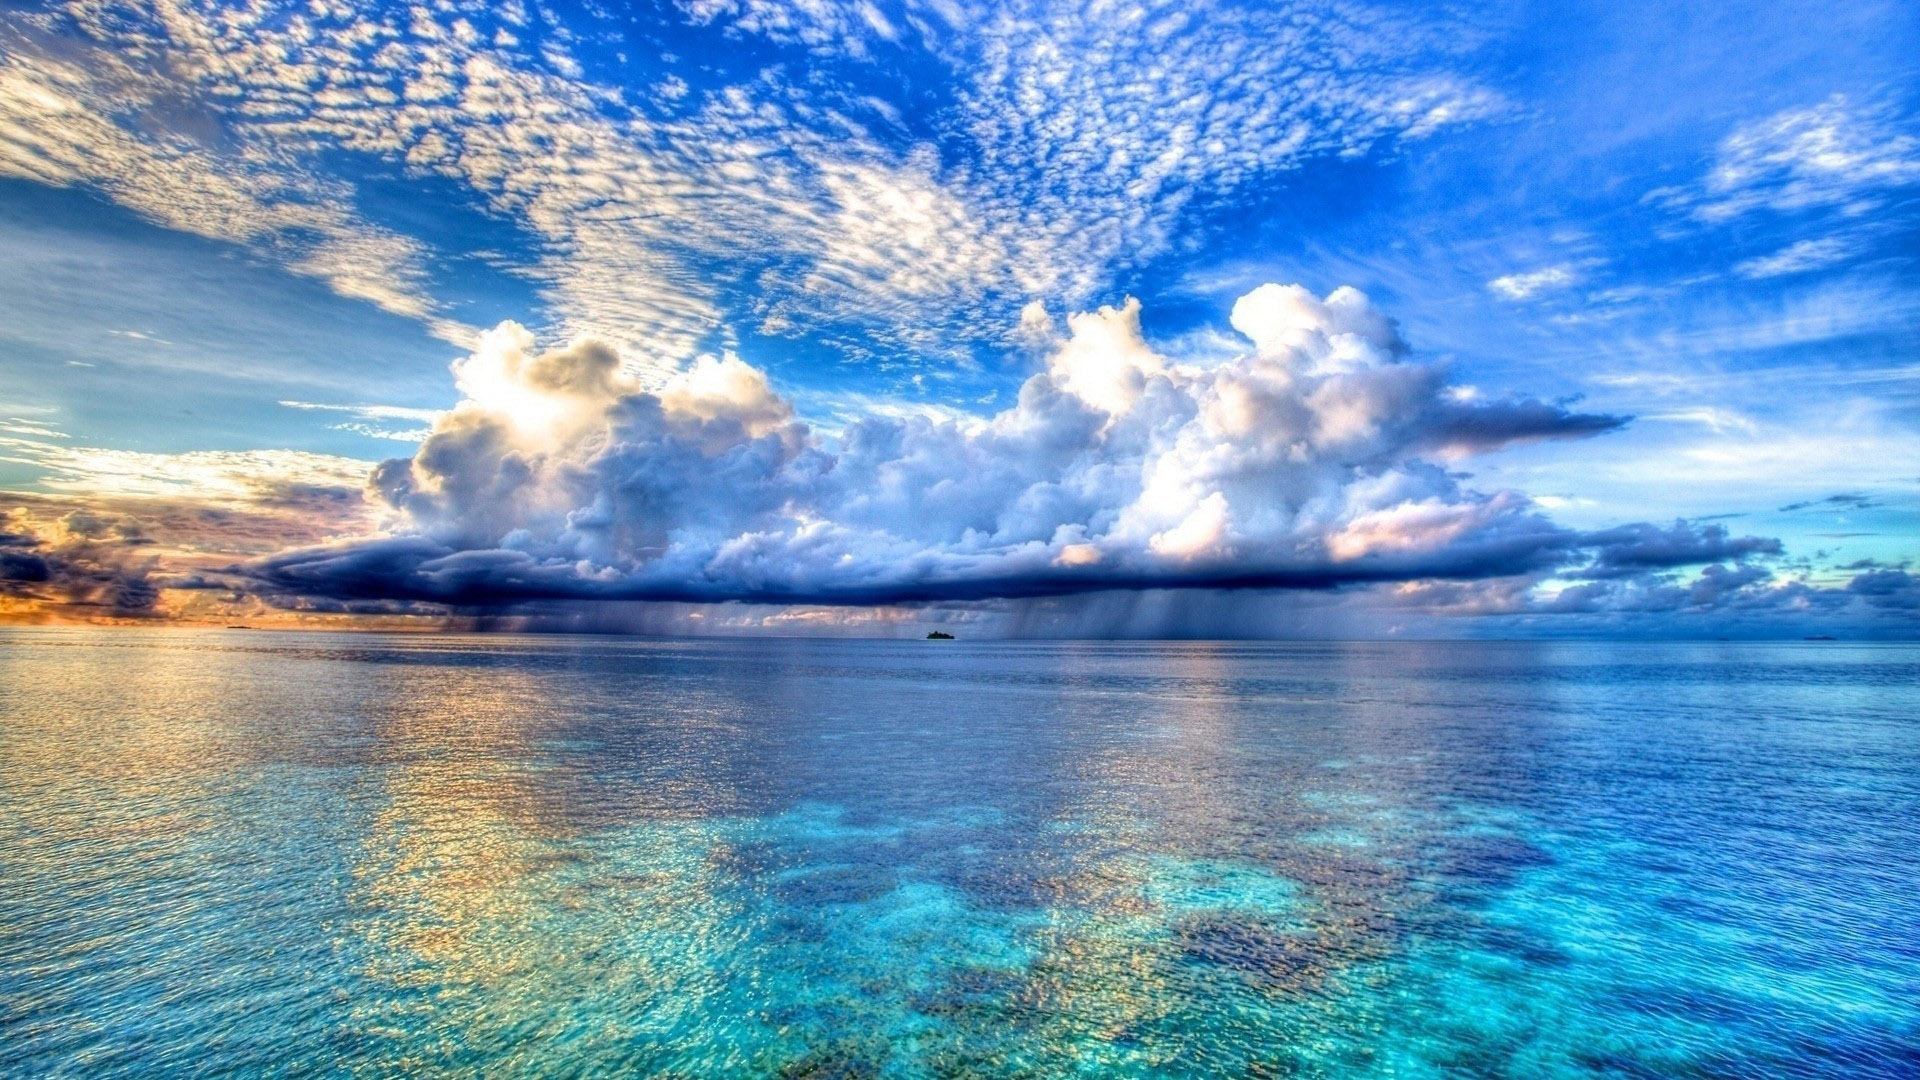 Beautiful Sky And Beach Wallpaper Download Wallpaper